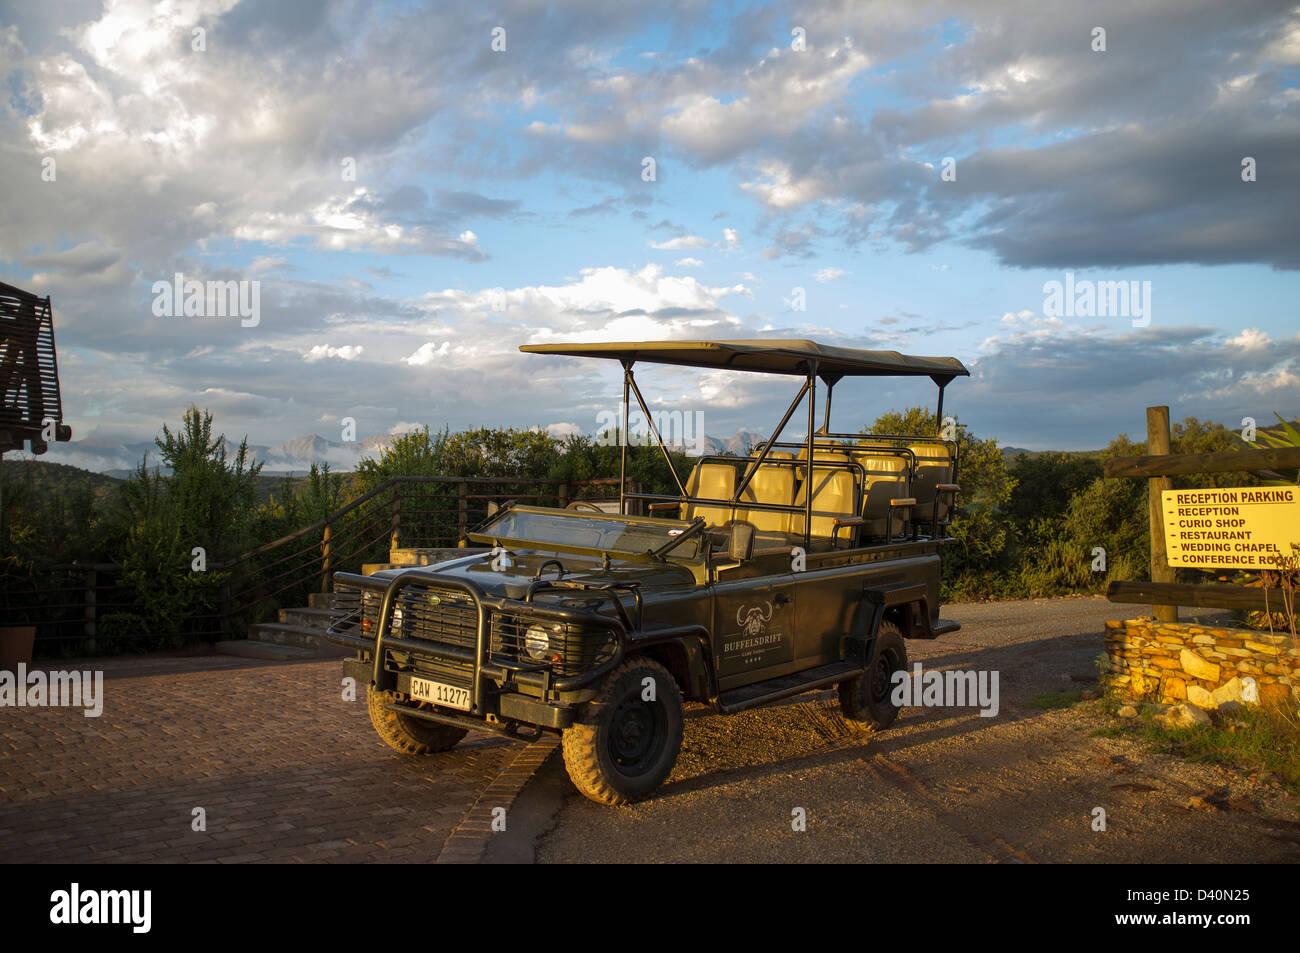 Land Rover Defender safari transport. South Africa - Stock Image